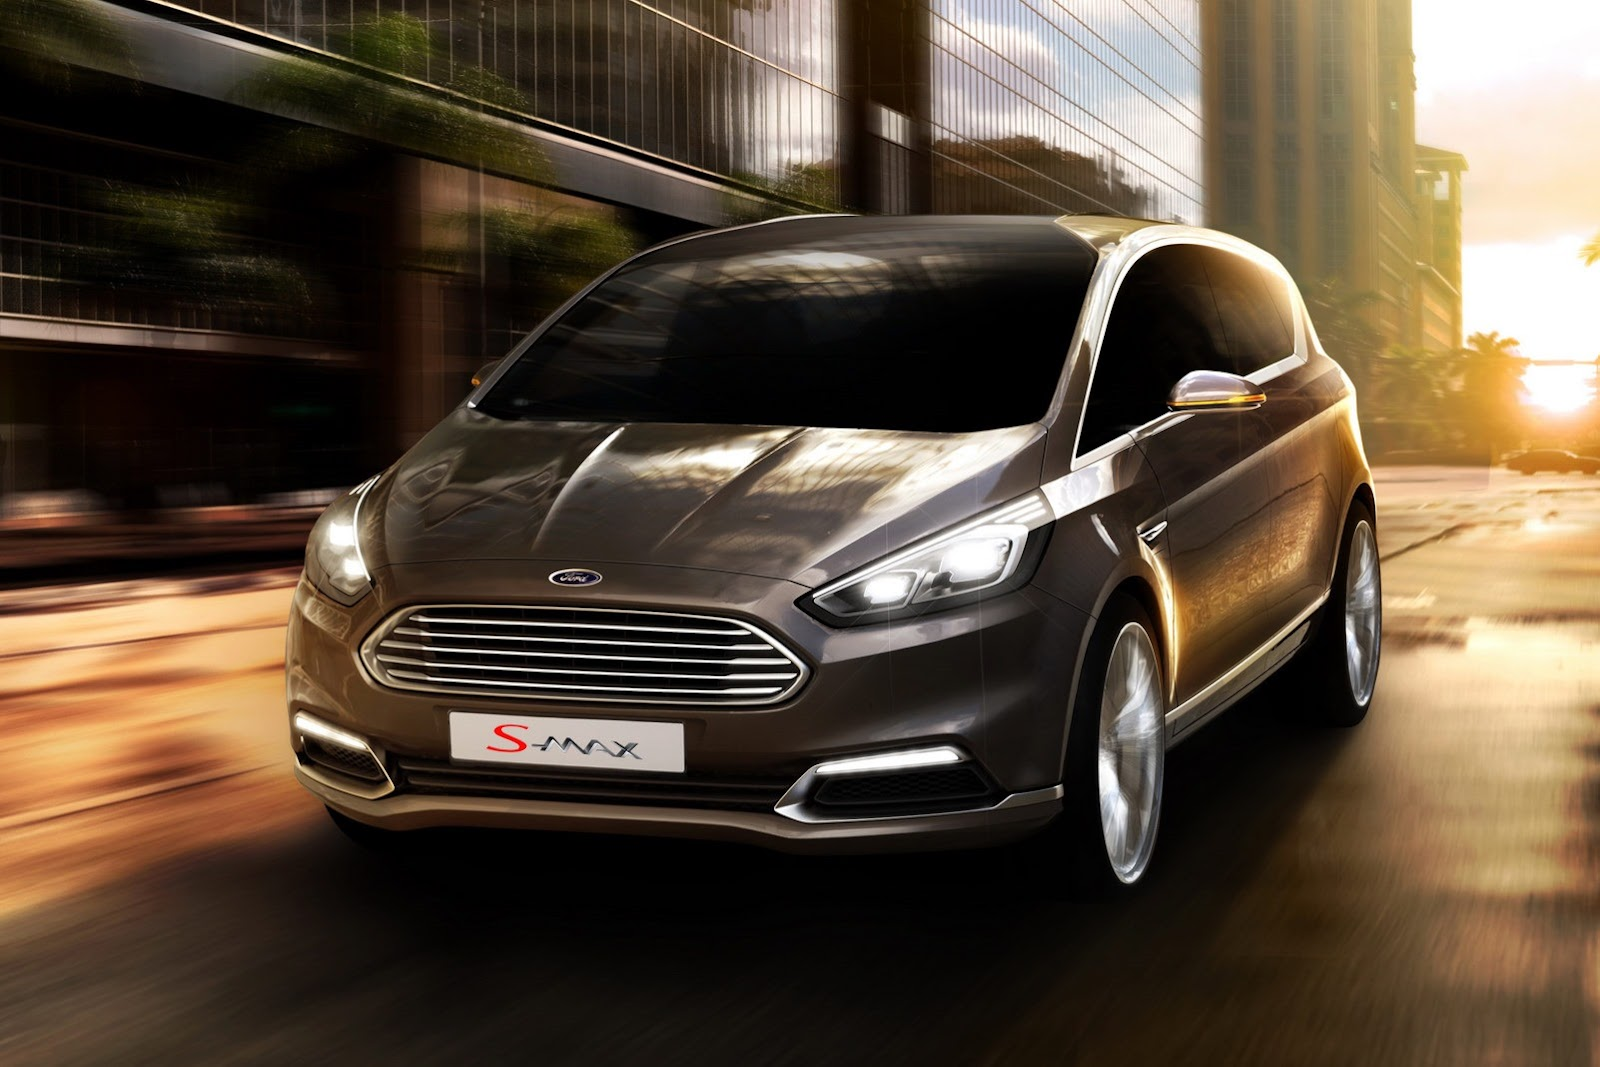 Ford s max concept 2 25255b2 25255d jpg